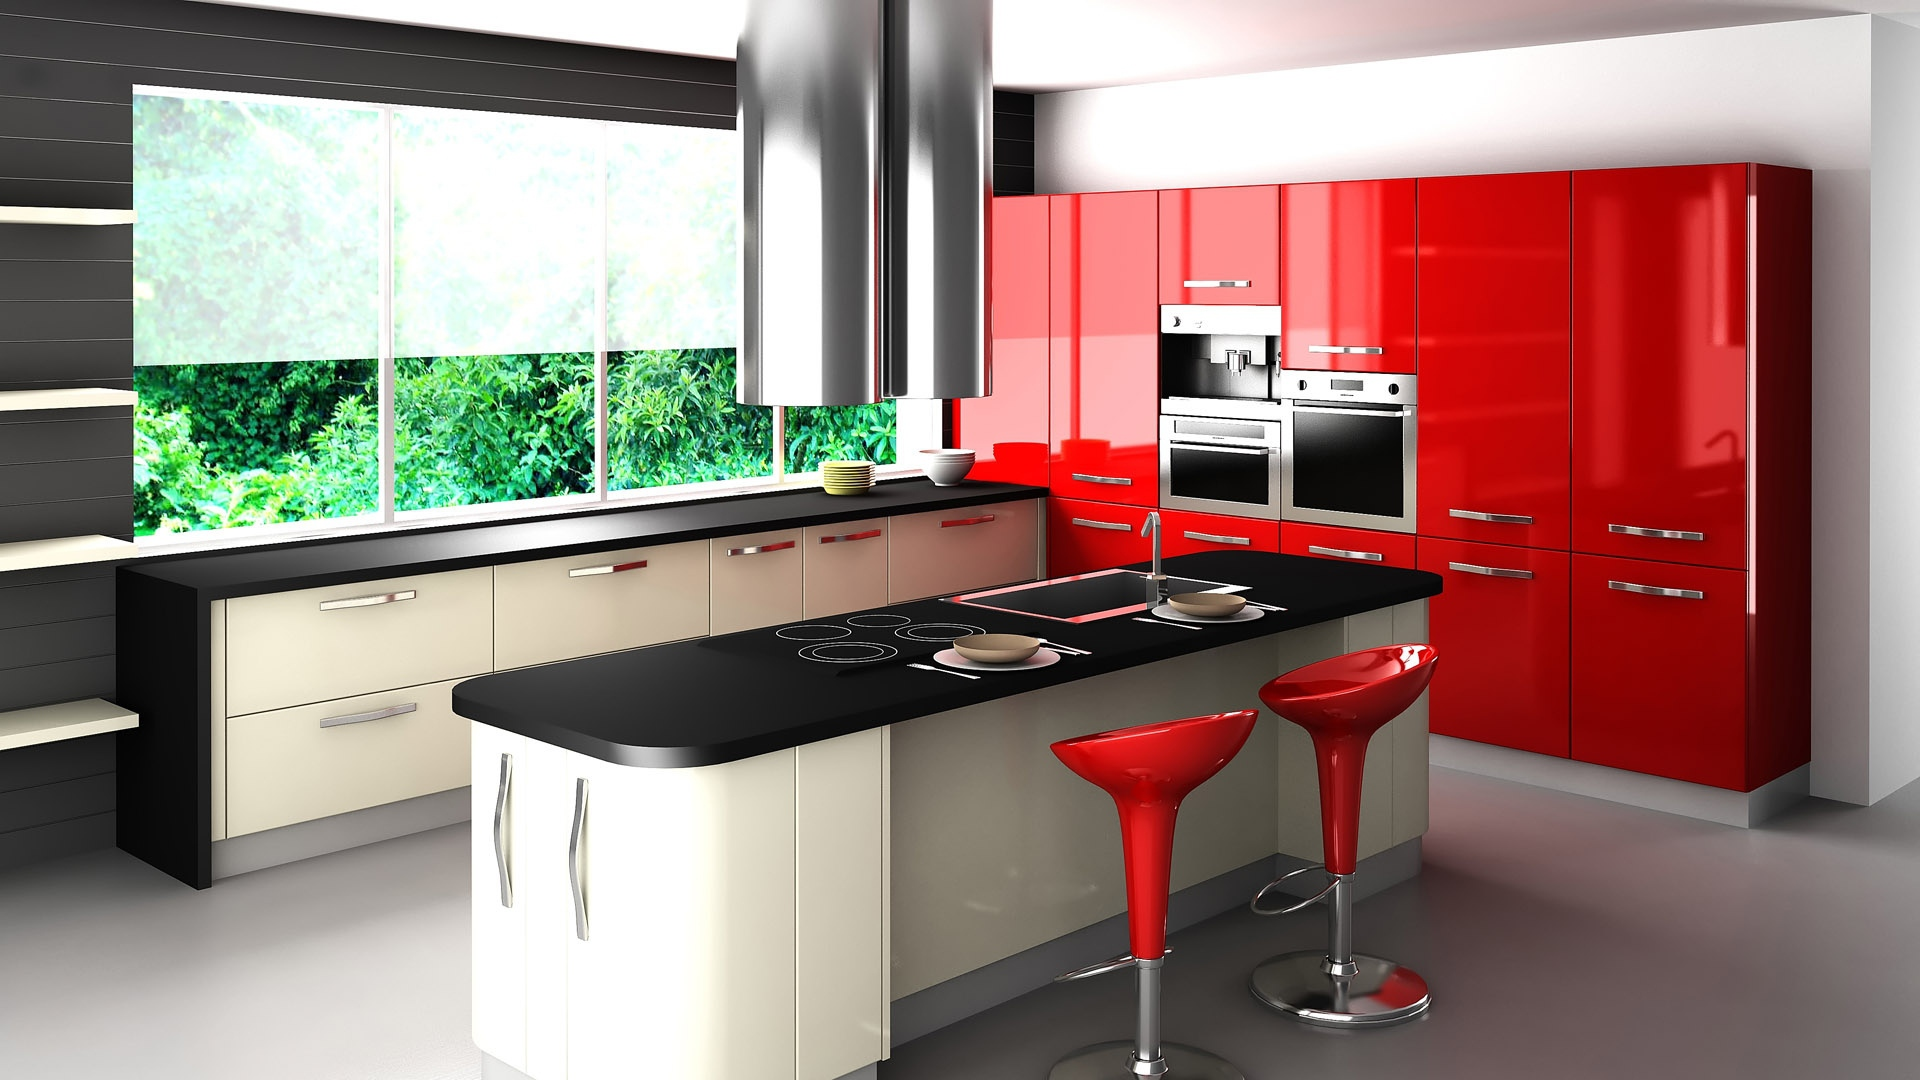 Kitchen Design Hd Images download wallpaper 1920x1080 kitchen design, interior, design full